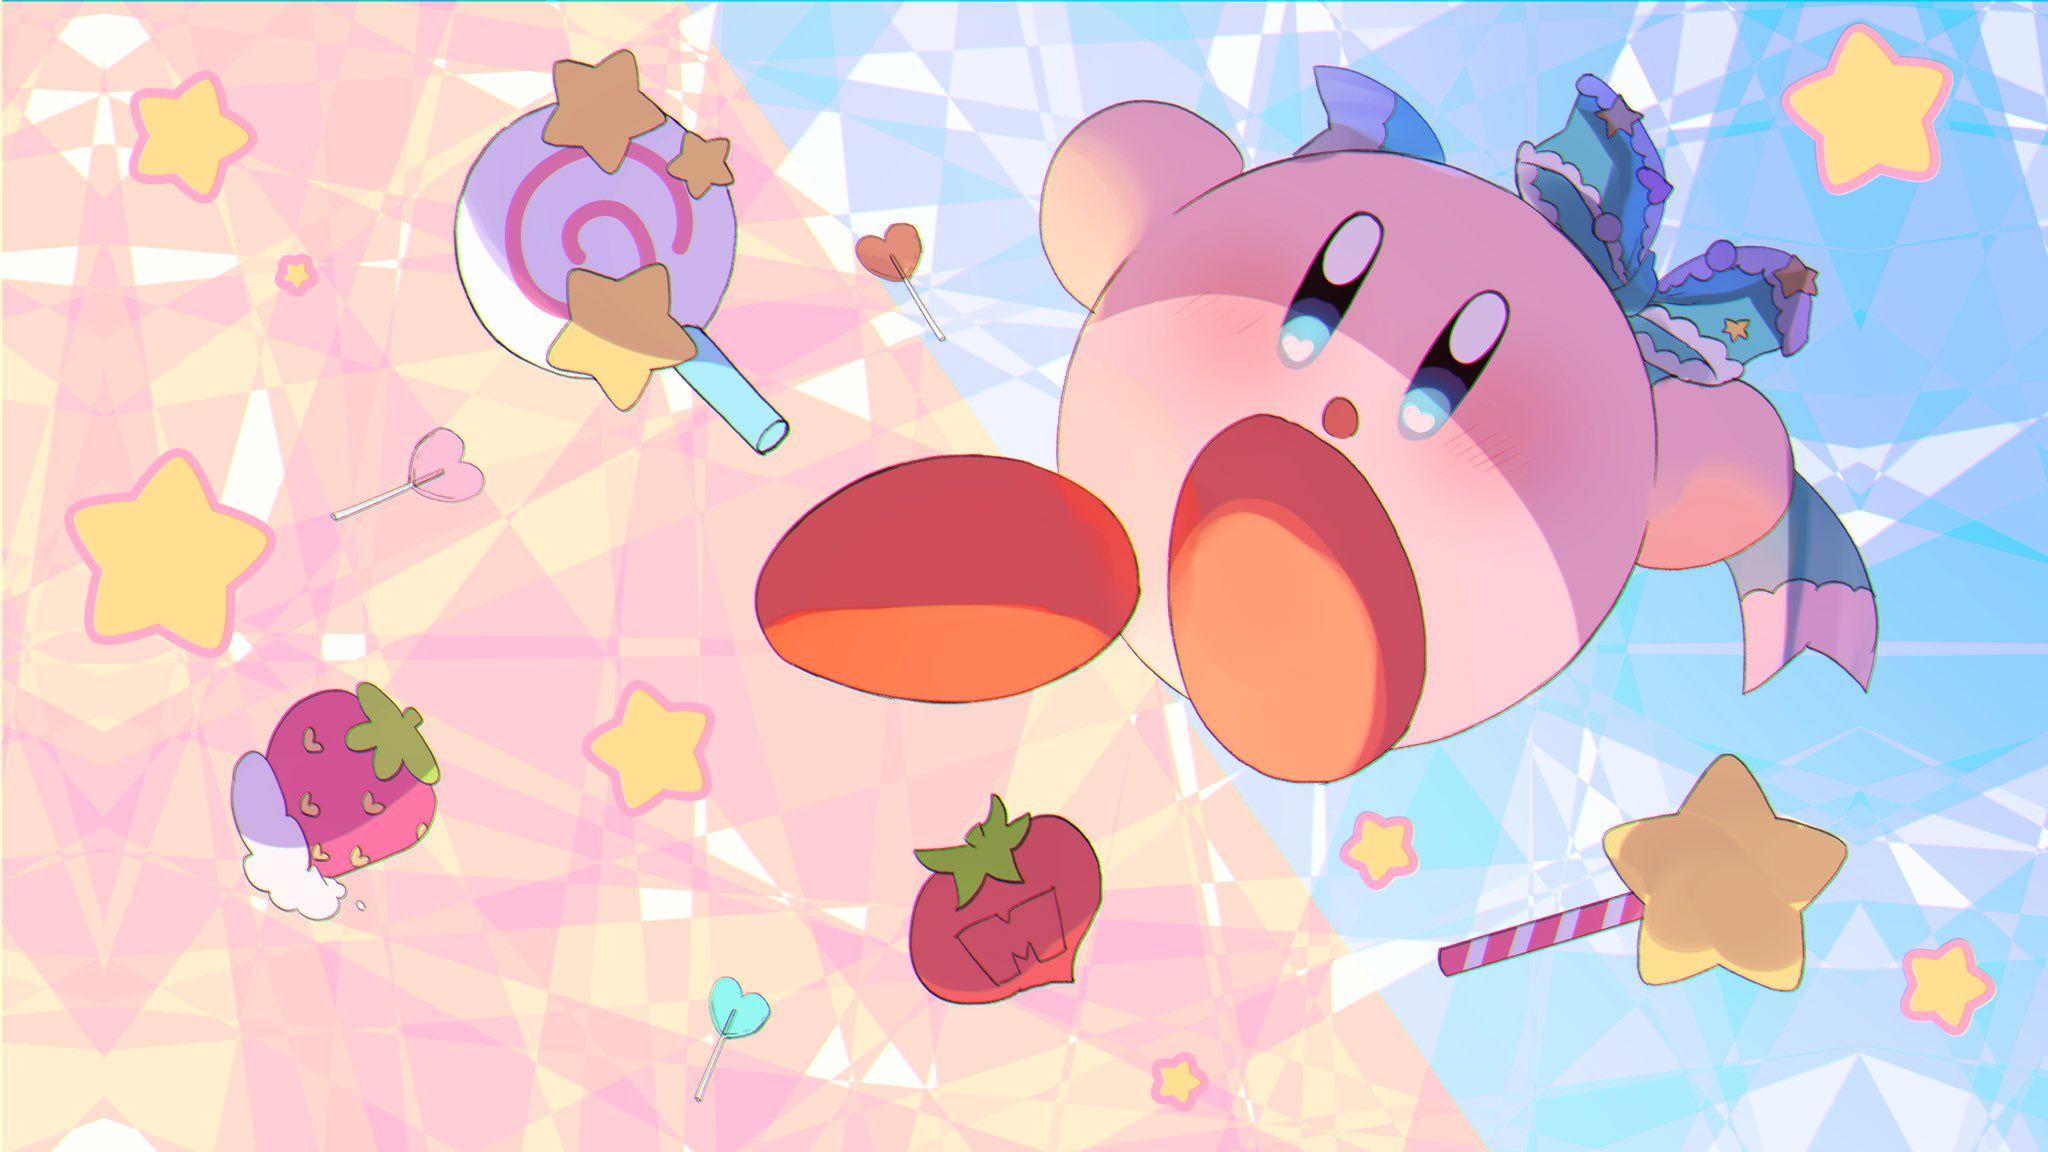 Pin By Lavi On Kirby Cute Laptop Wallpaper Pink Wallpaper Anime Kawaii Wallpaper